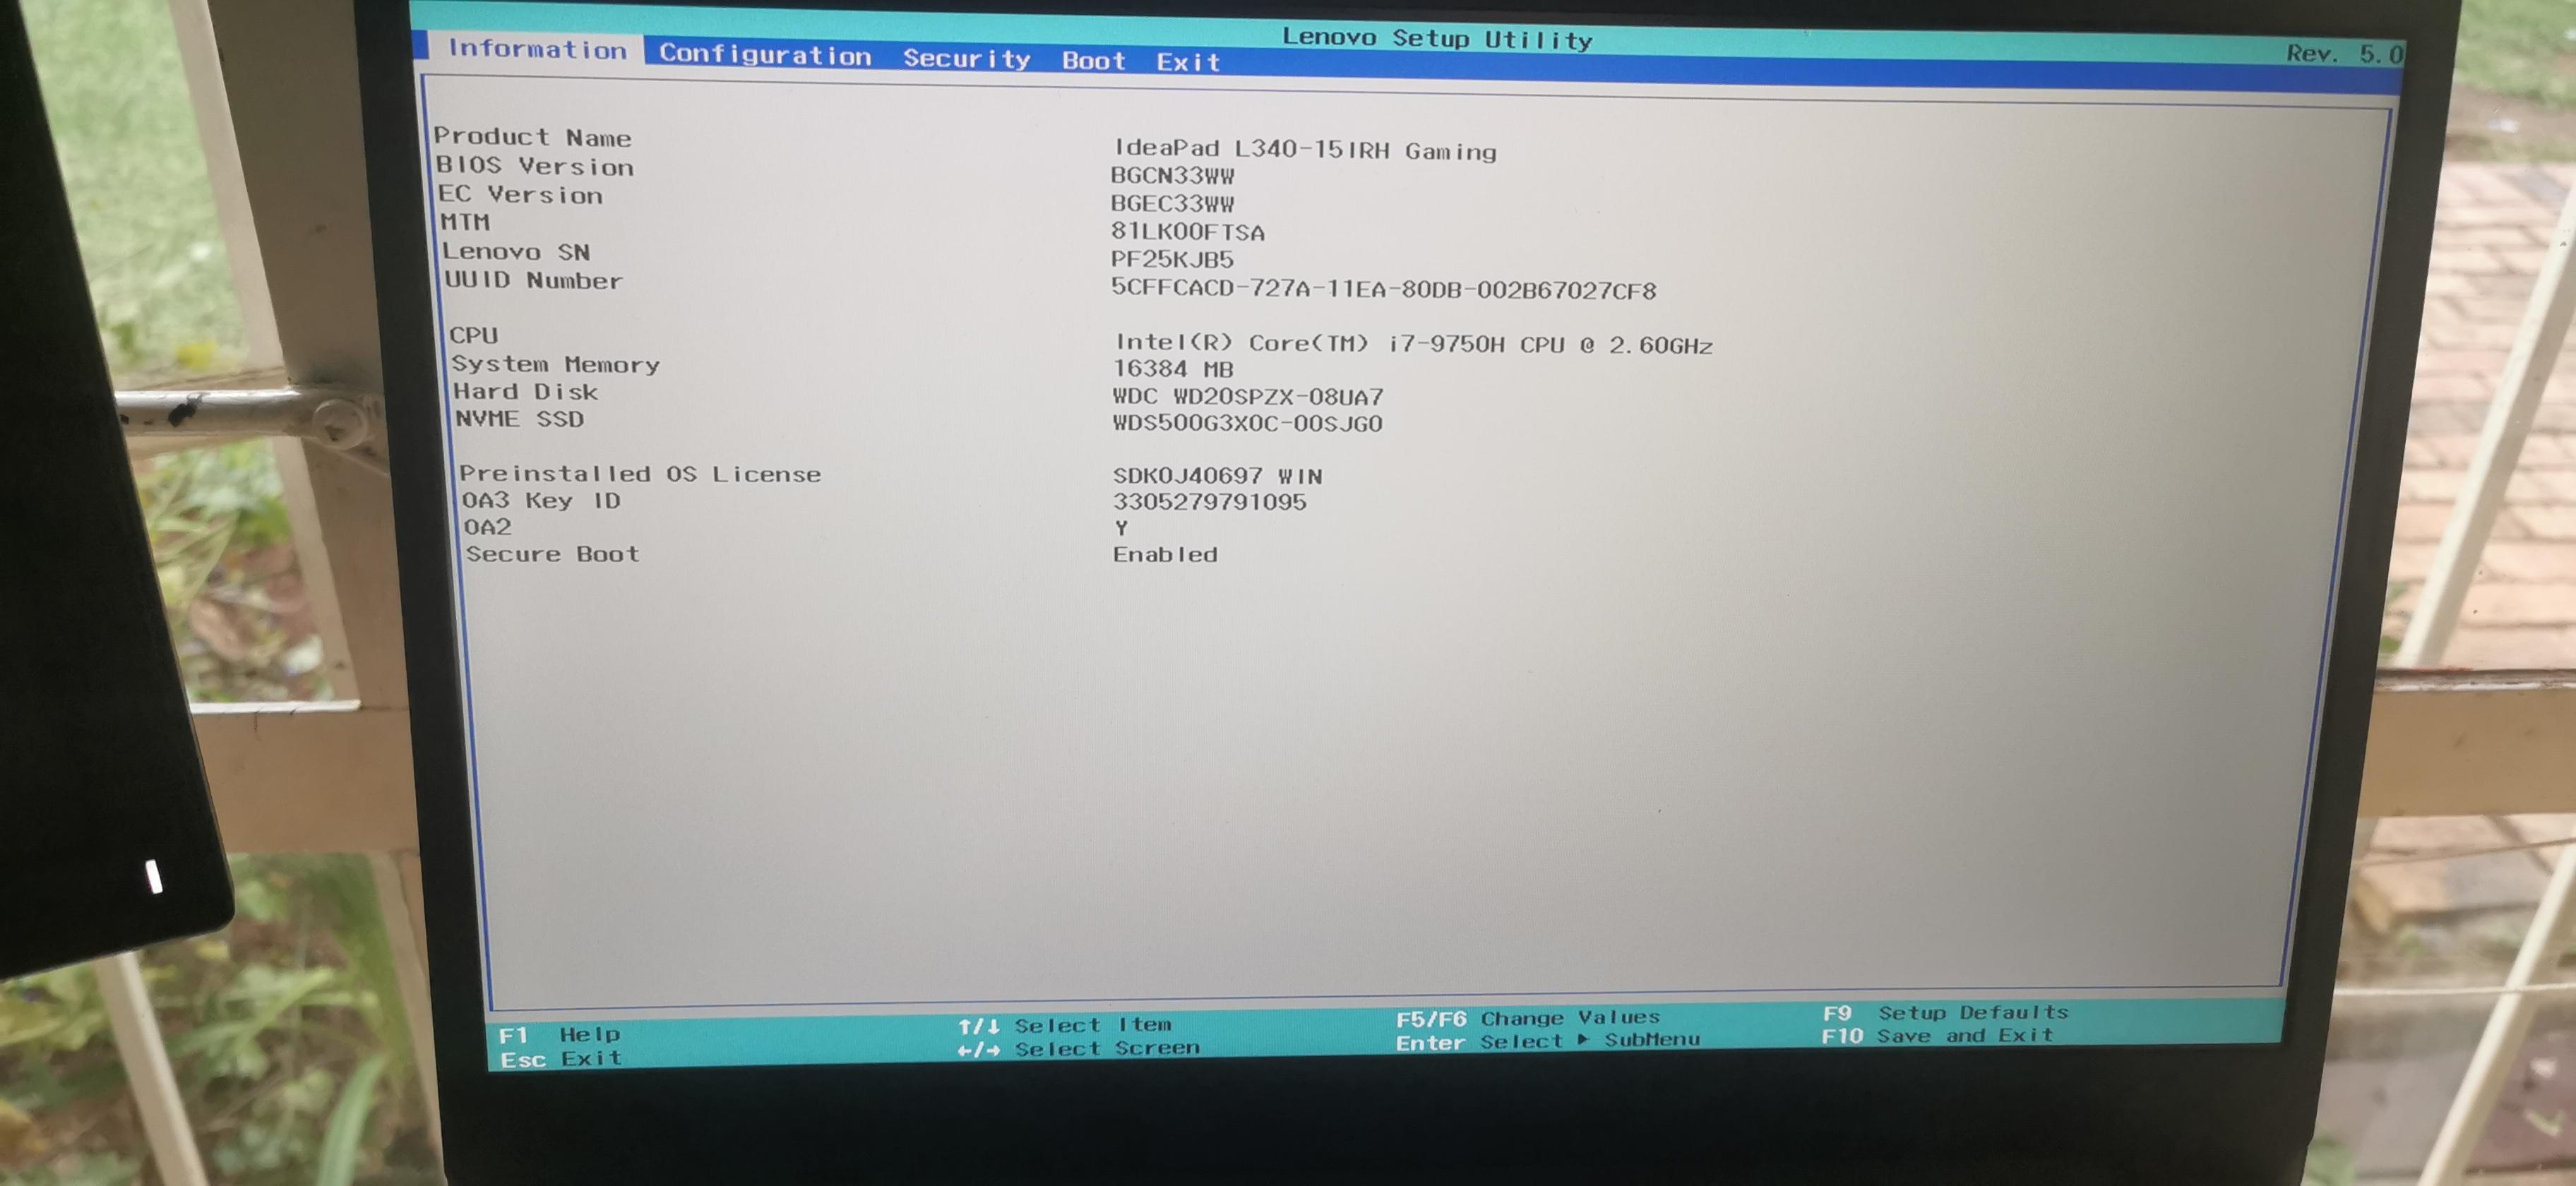 BIOS-Information